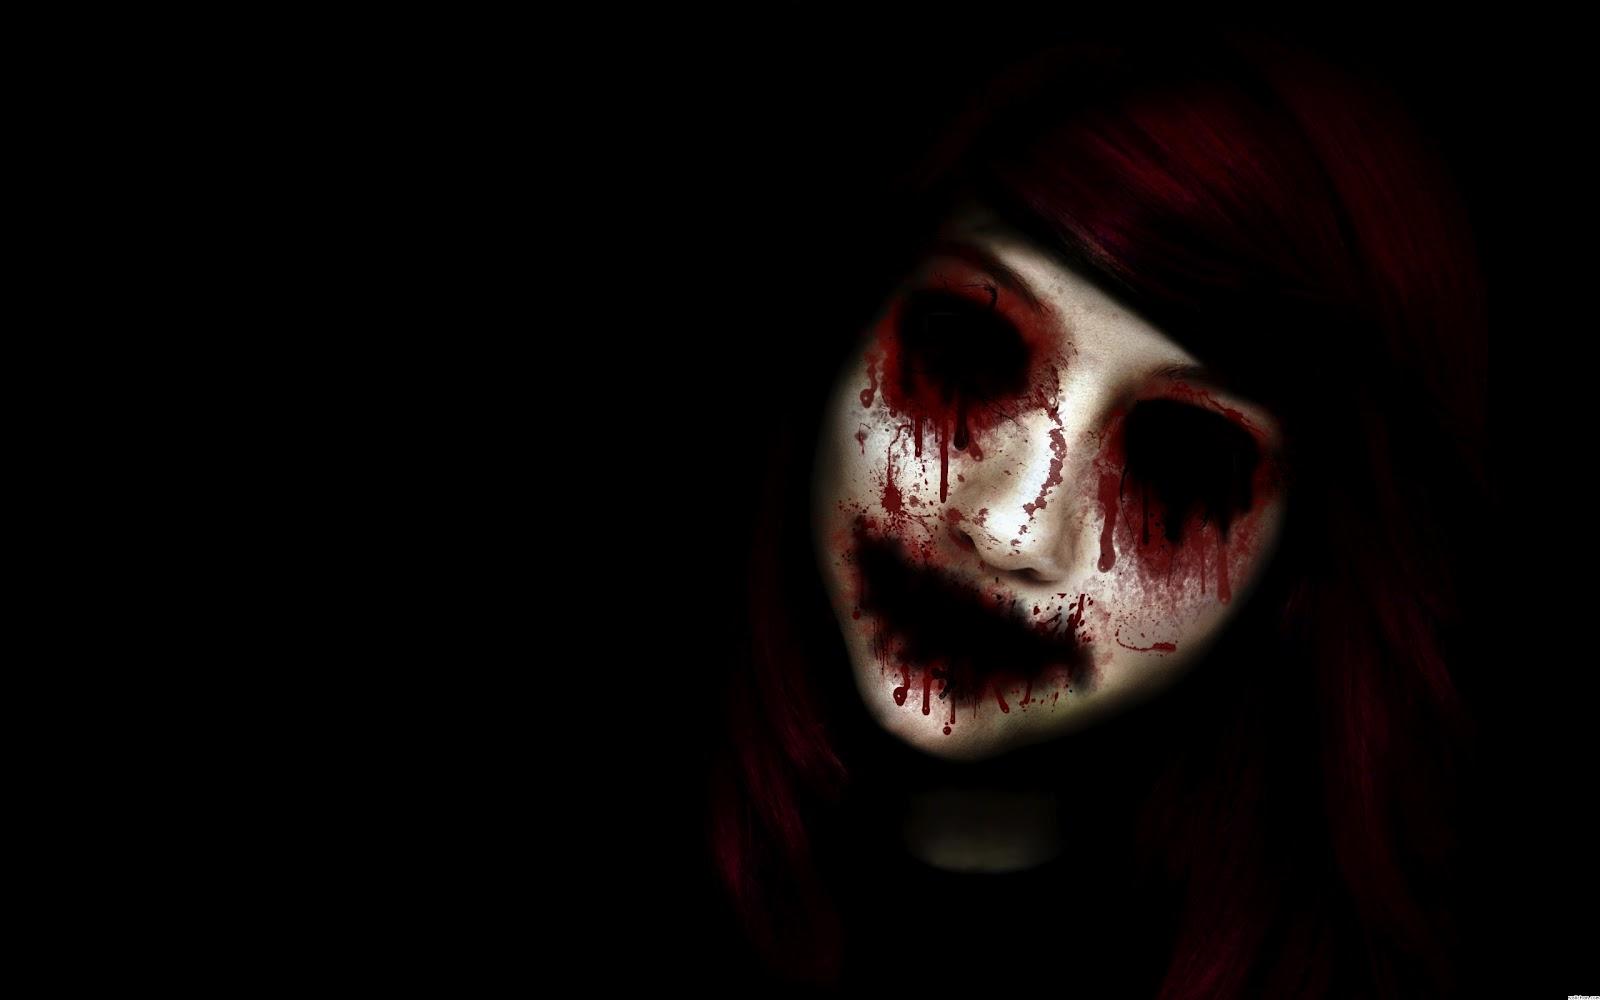 horror eye wallpaper hd - photo #10